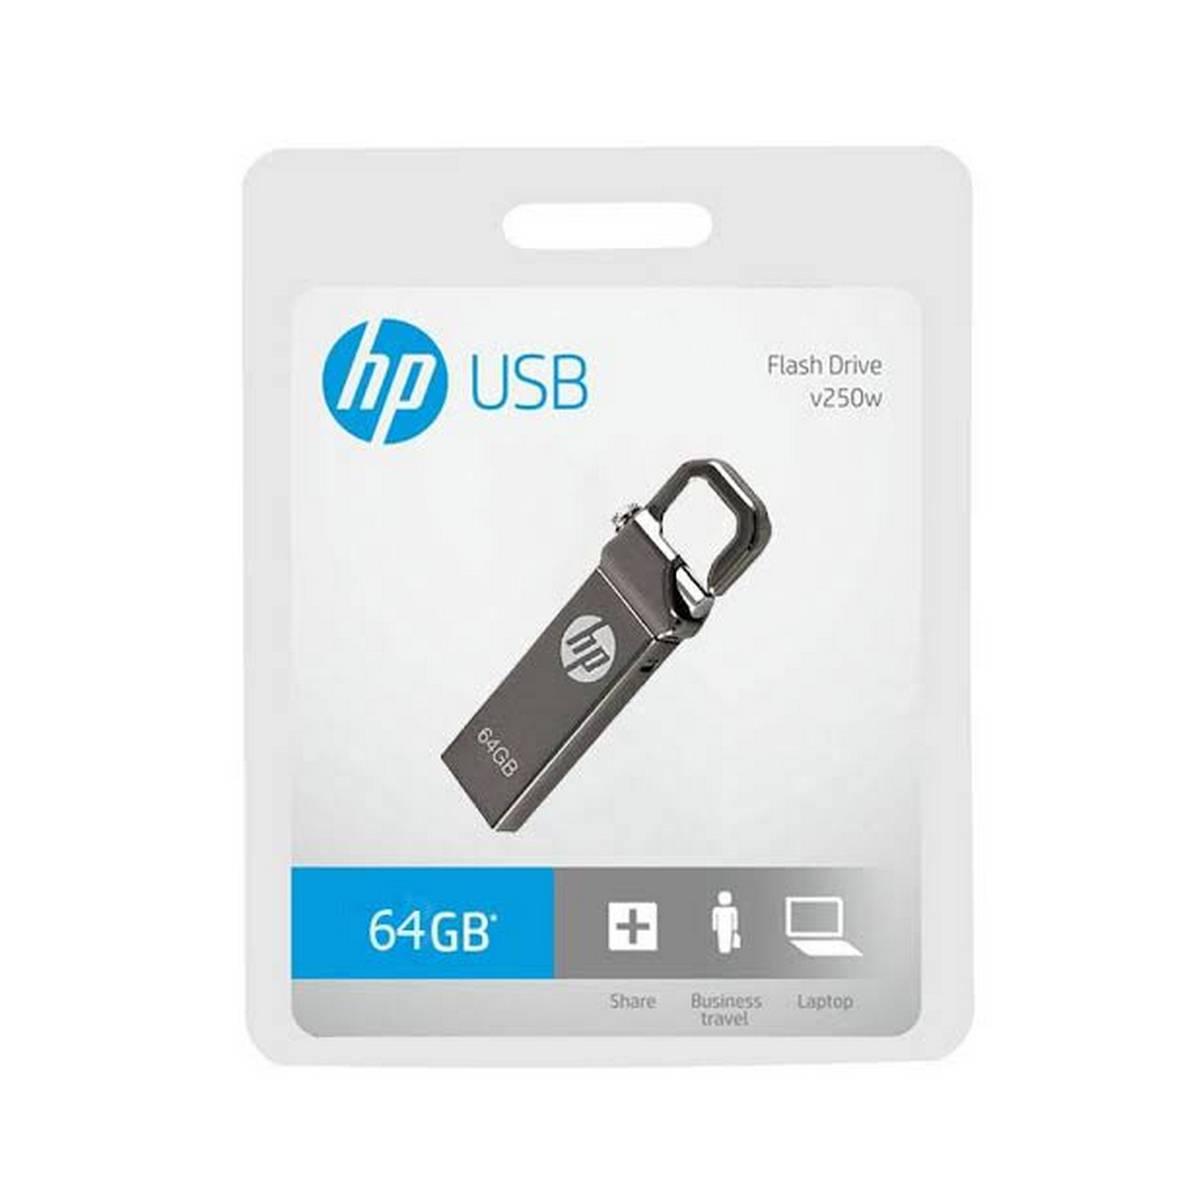 64GB HP USB Flash Drive-6 months warranty usb